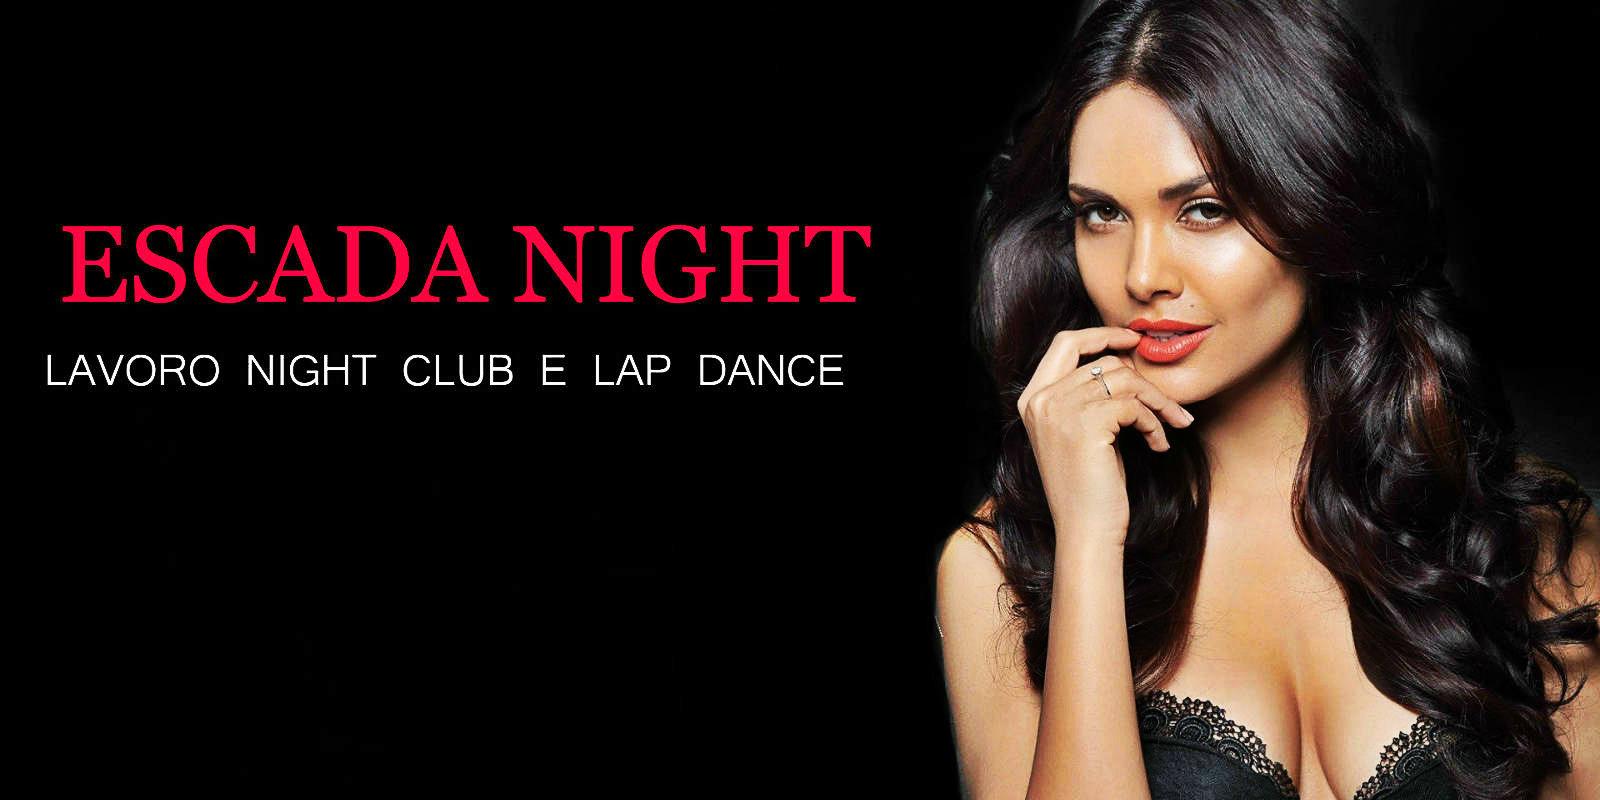 ESCADA NIGHT LAVORO NIGHT CLUB